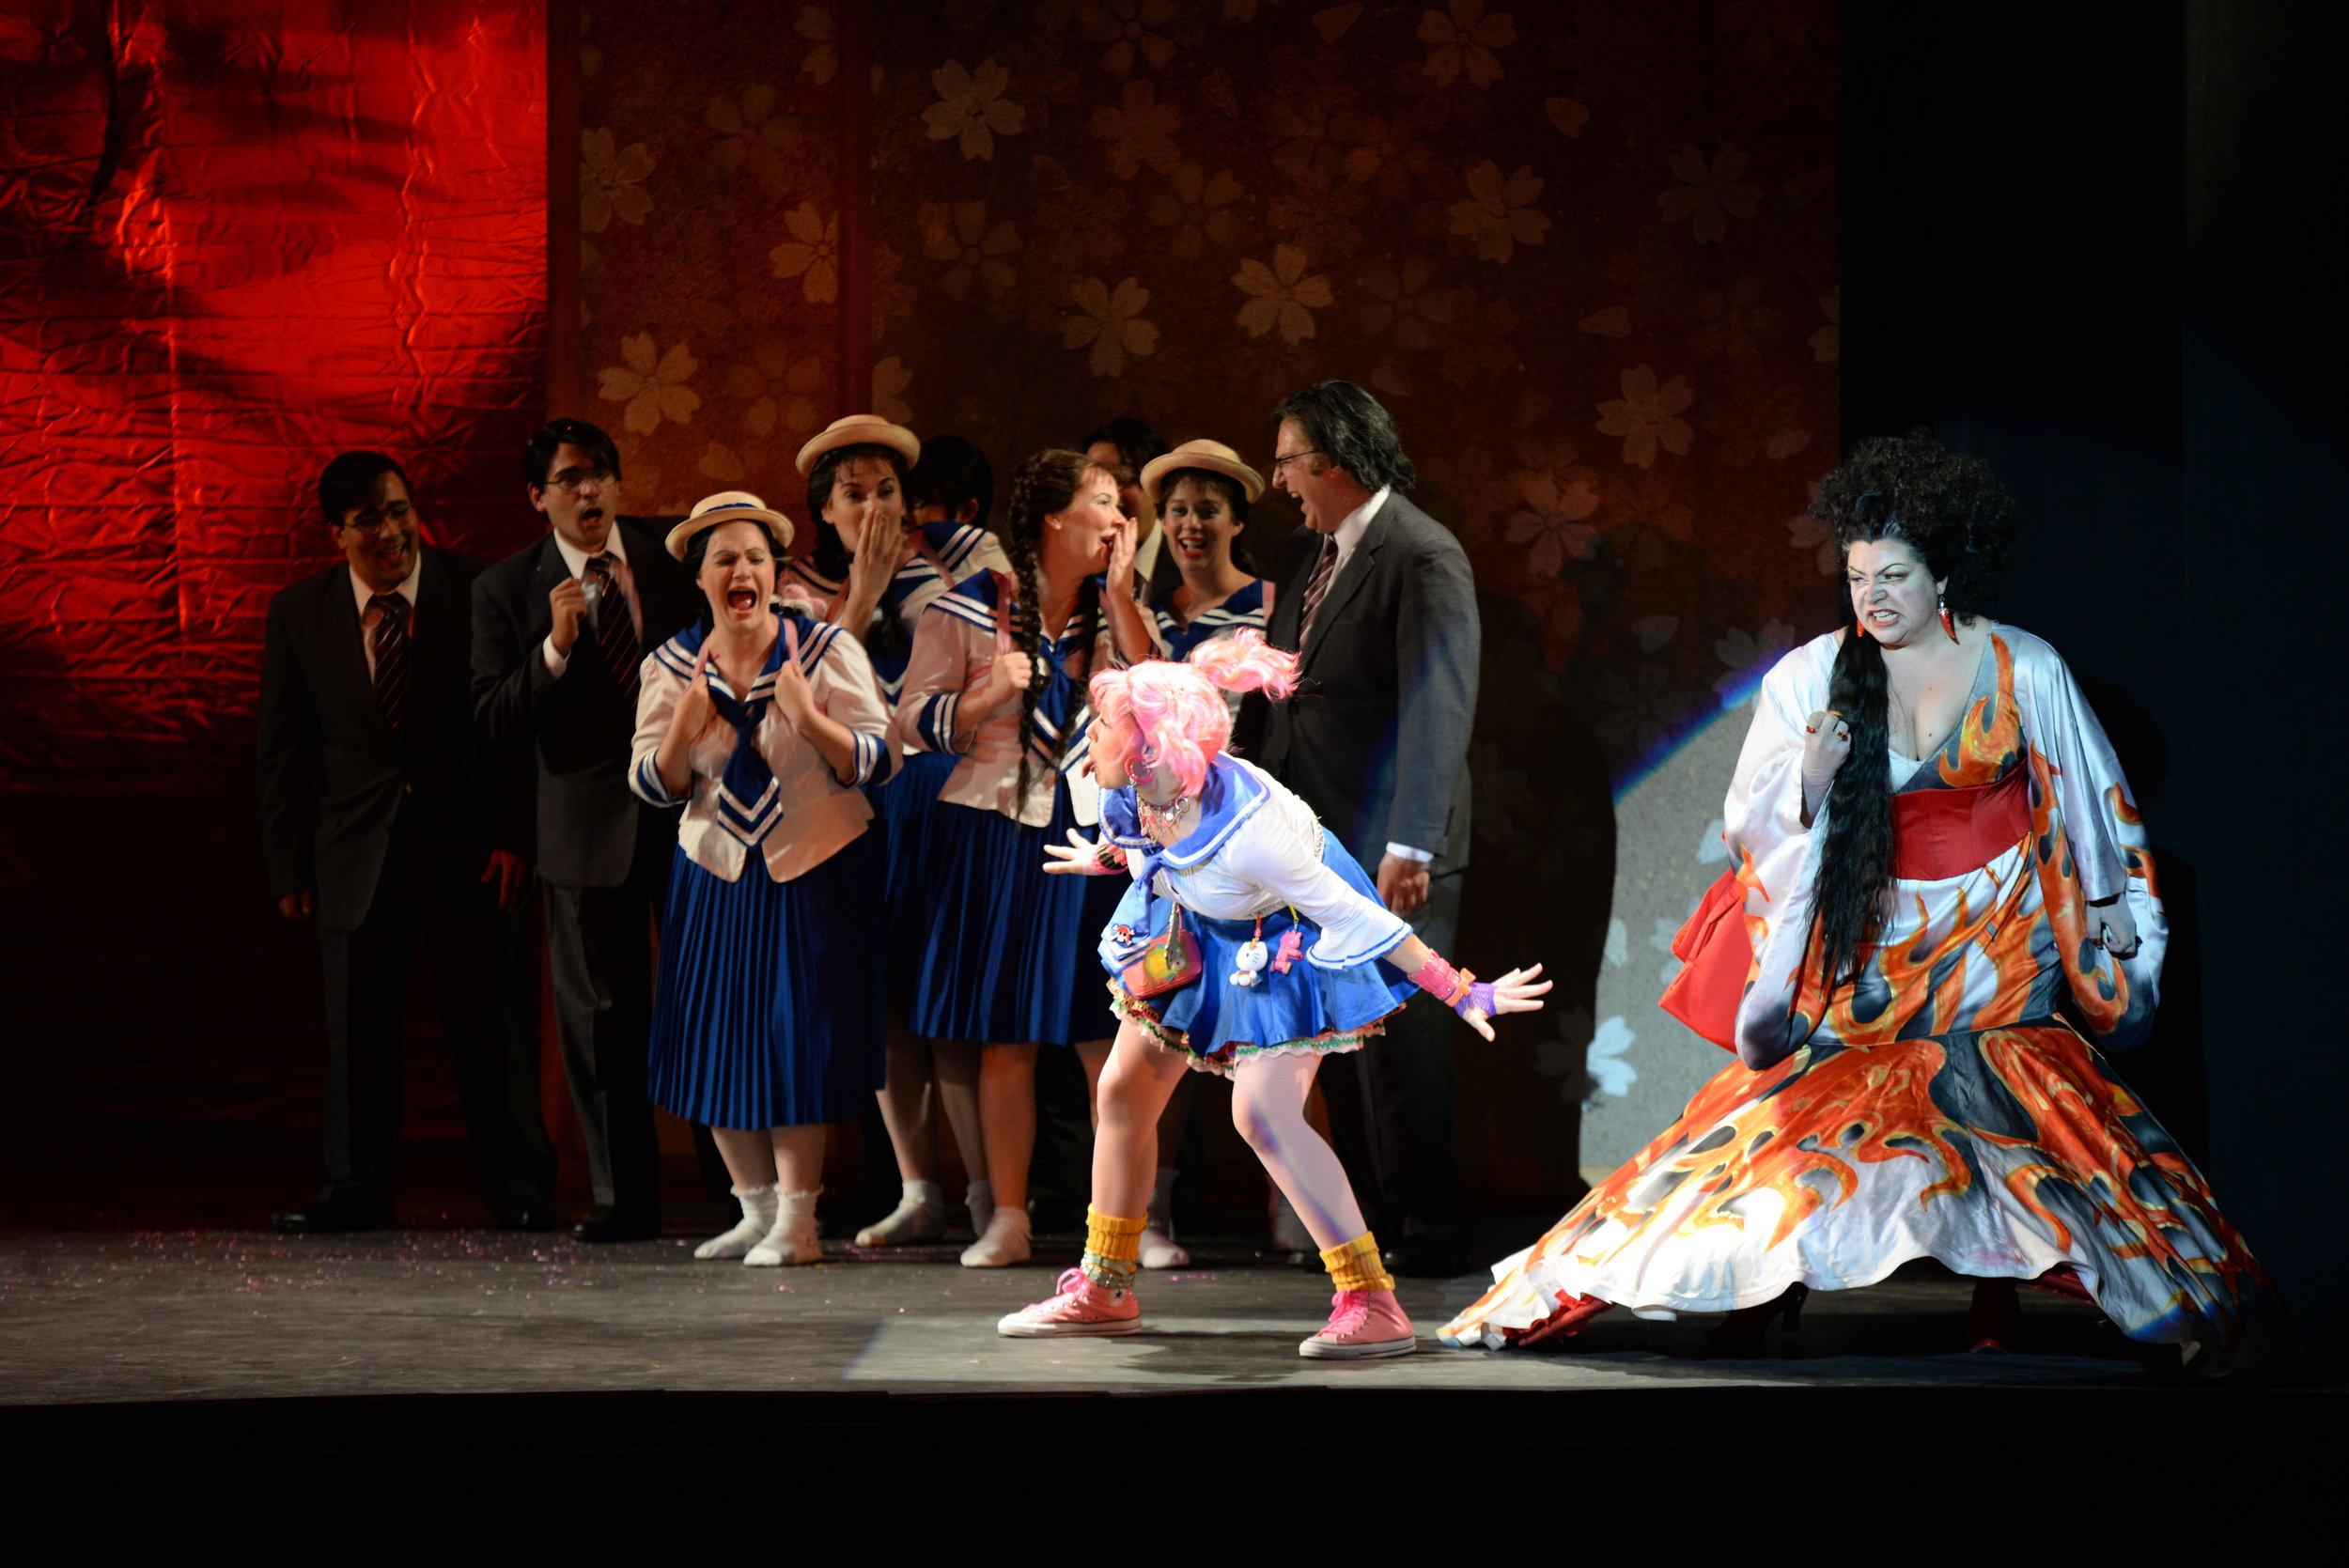 Photo Credit: Greg Funka for Chautauqua Opera -The Mikado